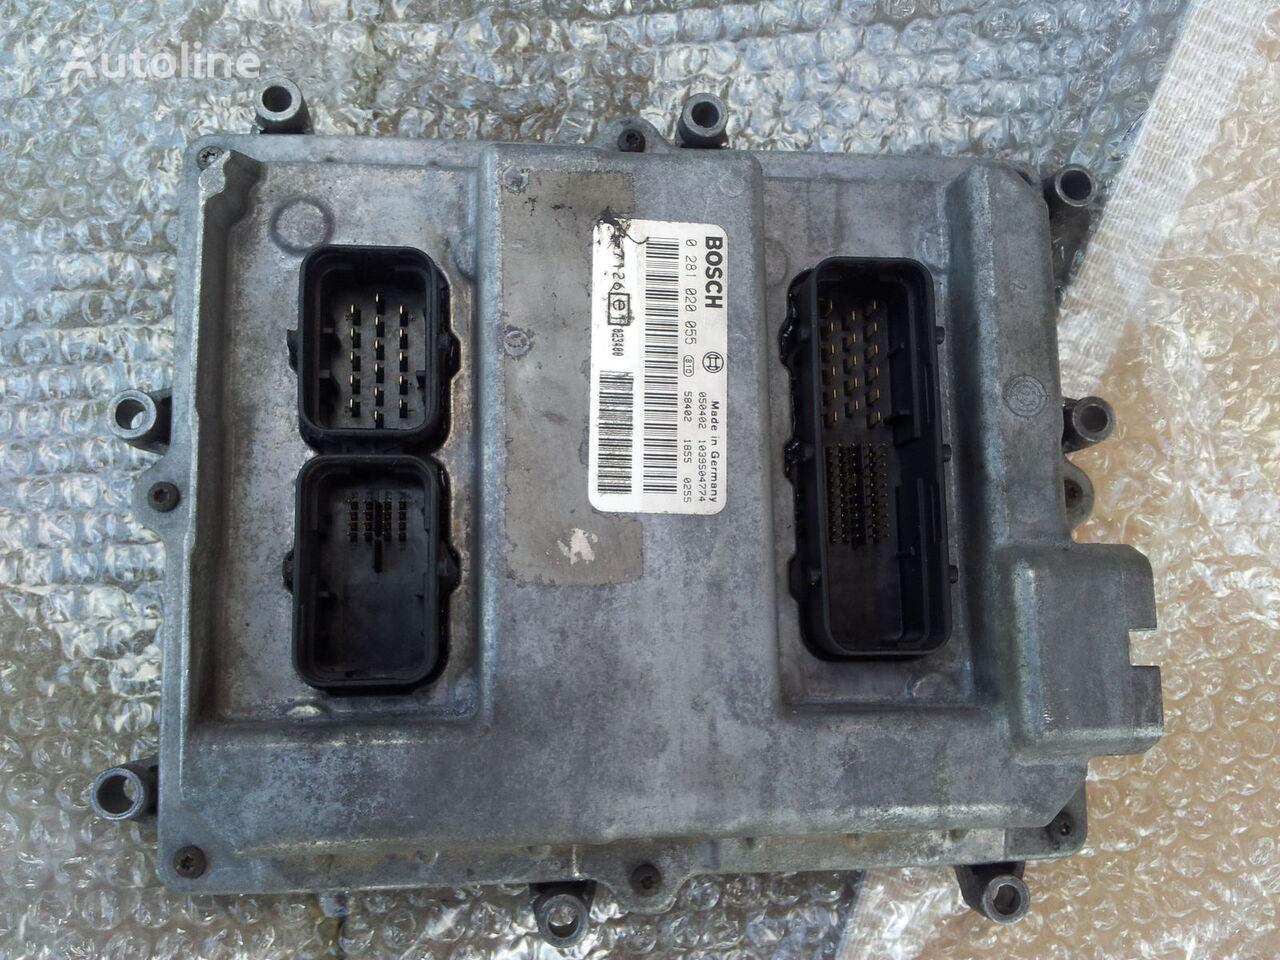 MAN Common Rail EDC, ECU electronic diesel control 0281020055, D2066 unitate de control pentru MAN TGA autotractor